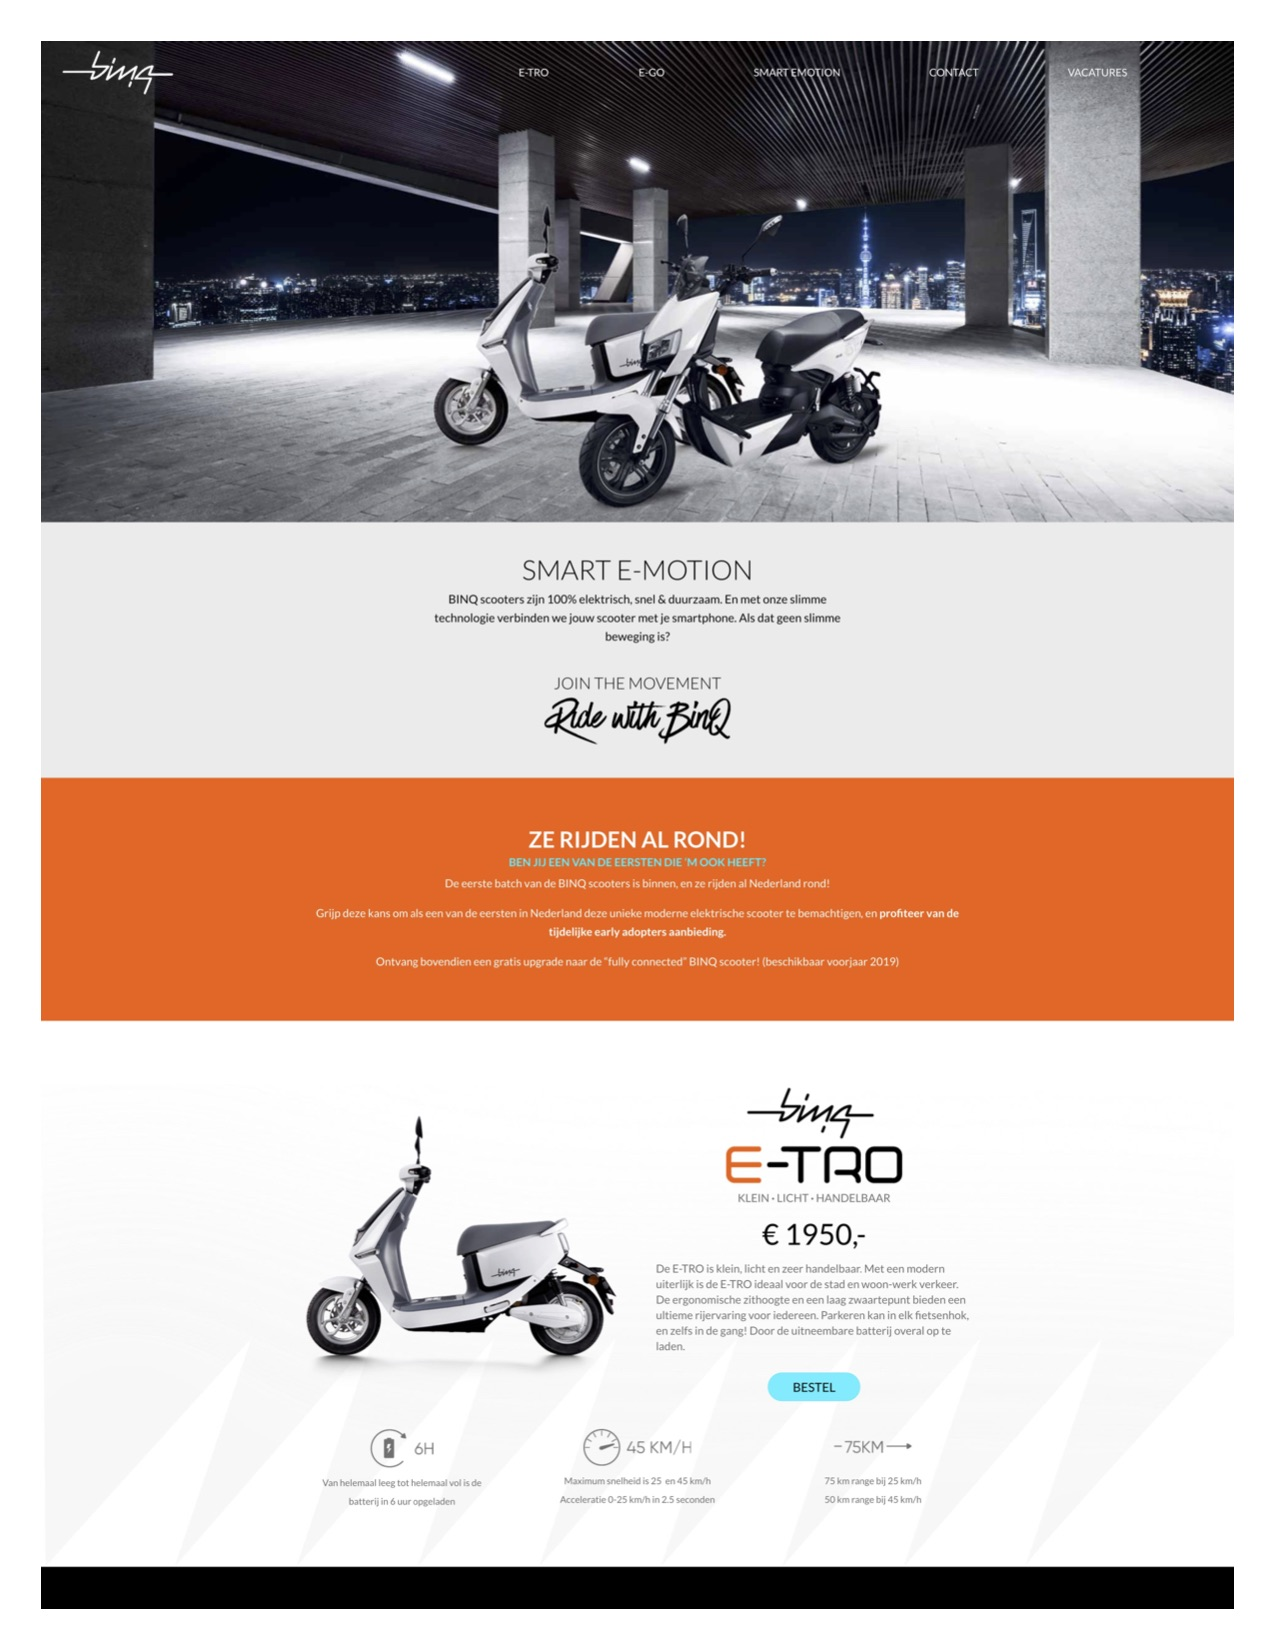 Binq-scooters-01